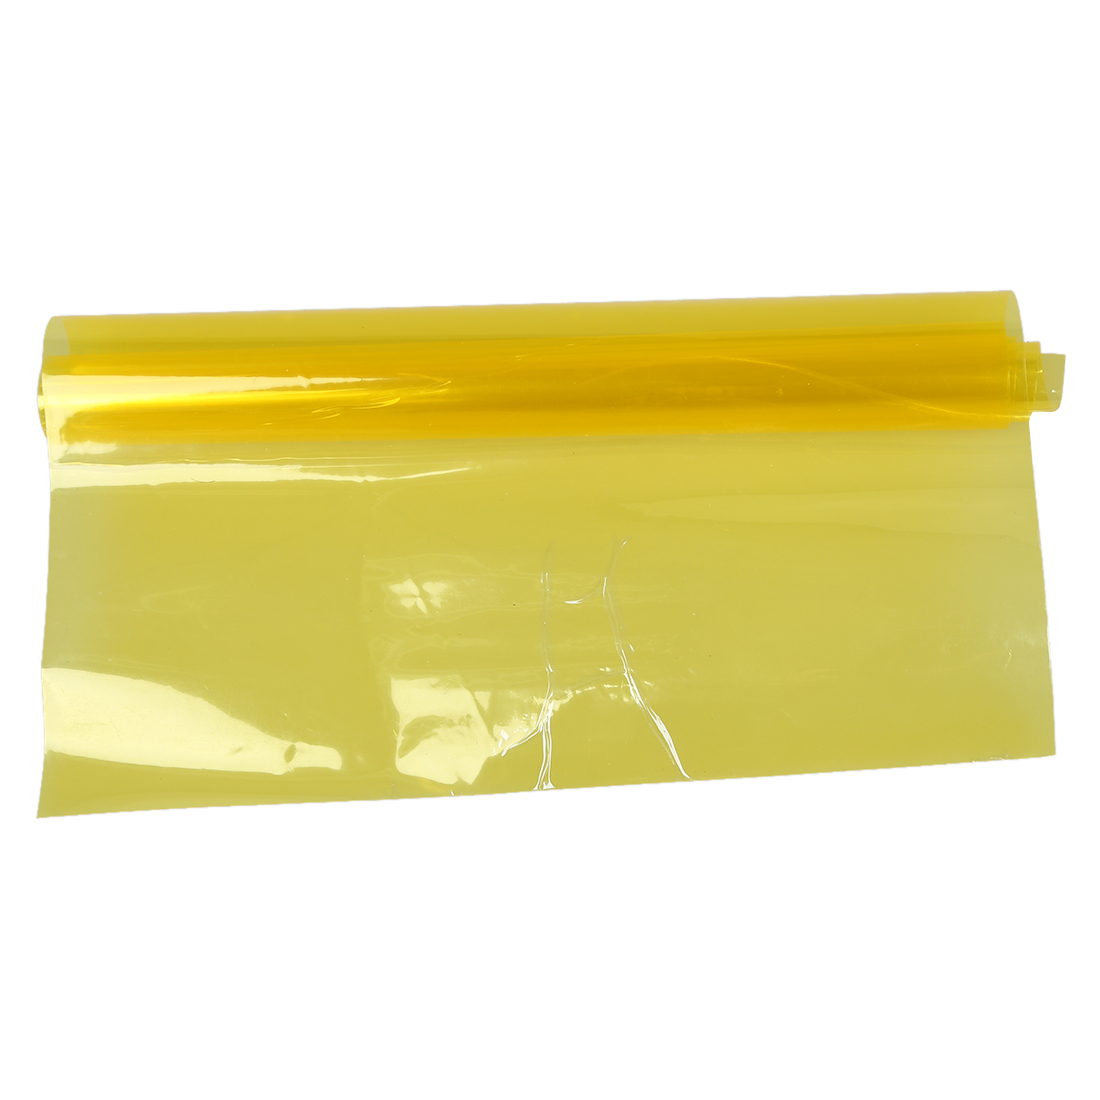 Yellow Car Tail Fog Head Light Headlight Tint Film Cover 30x60cm